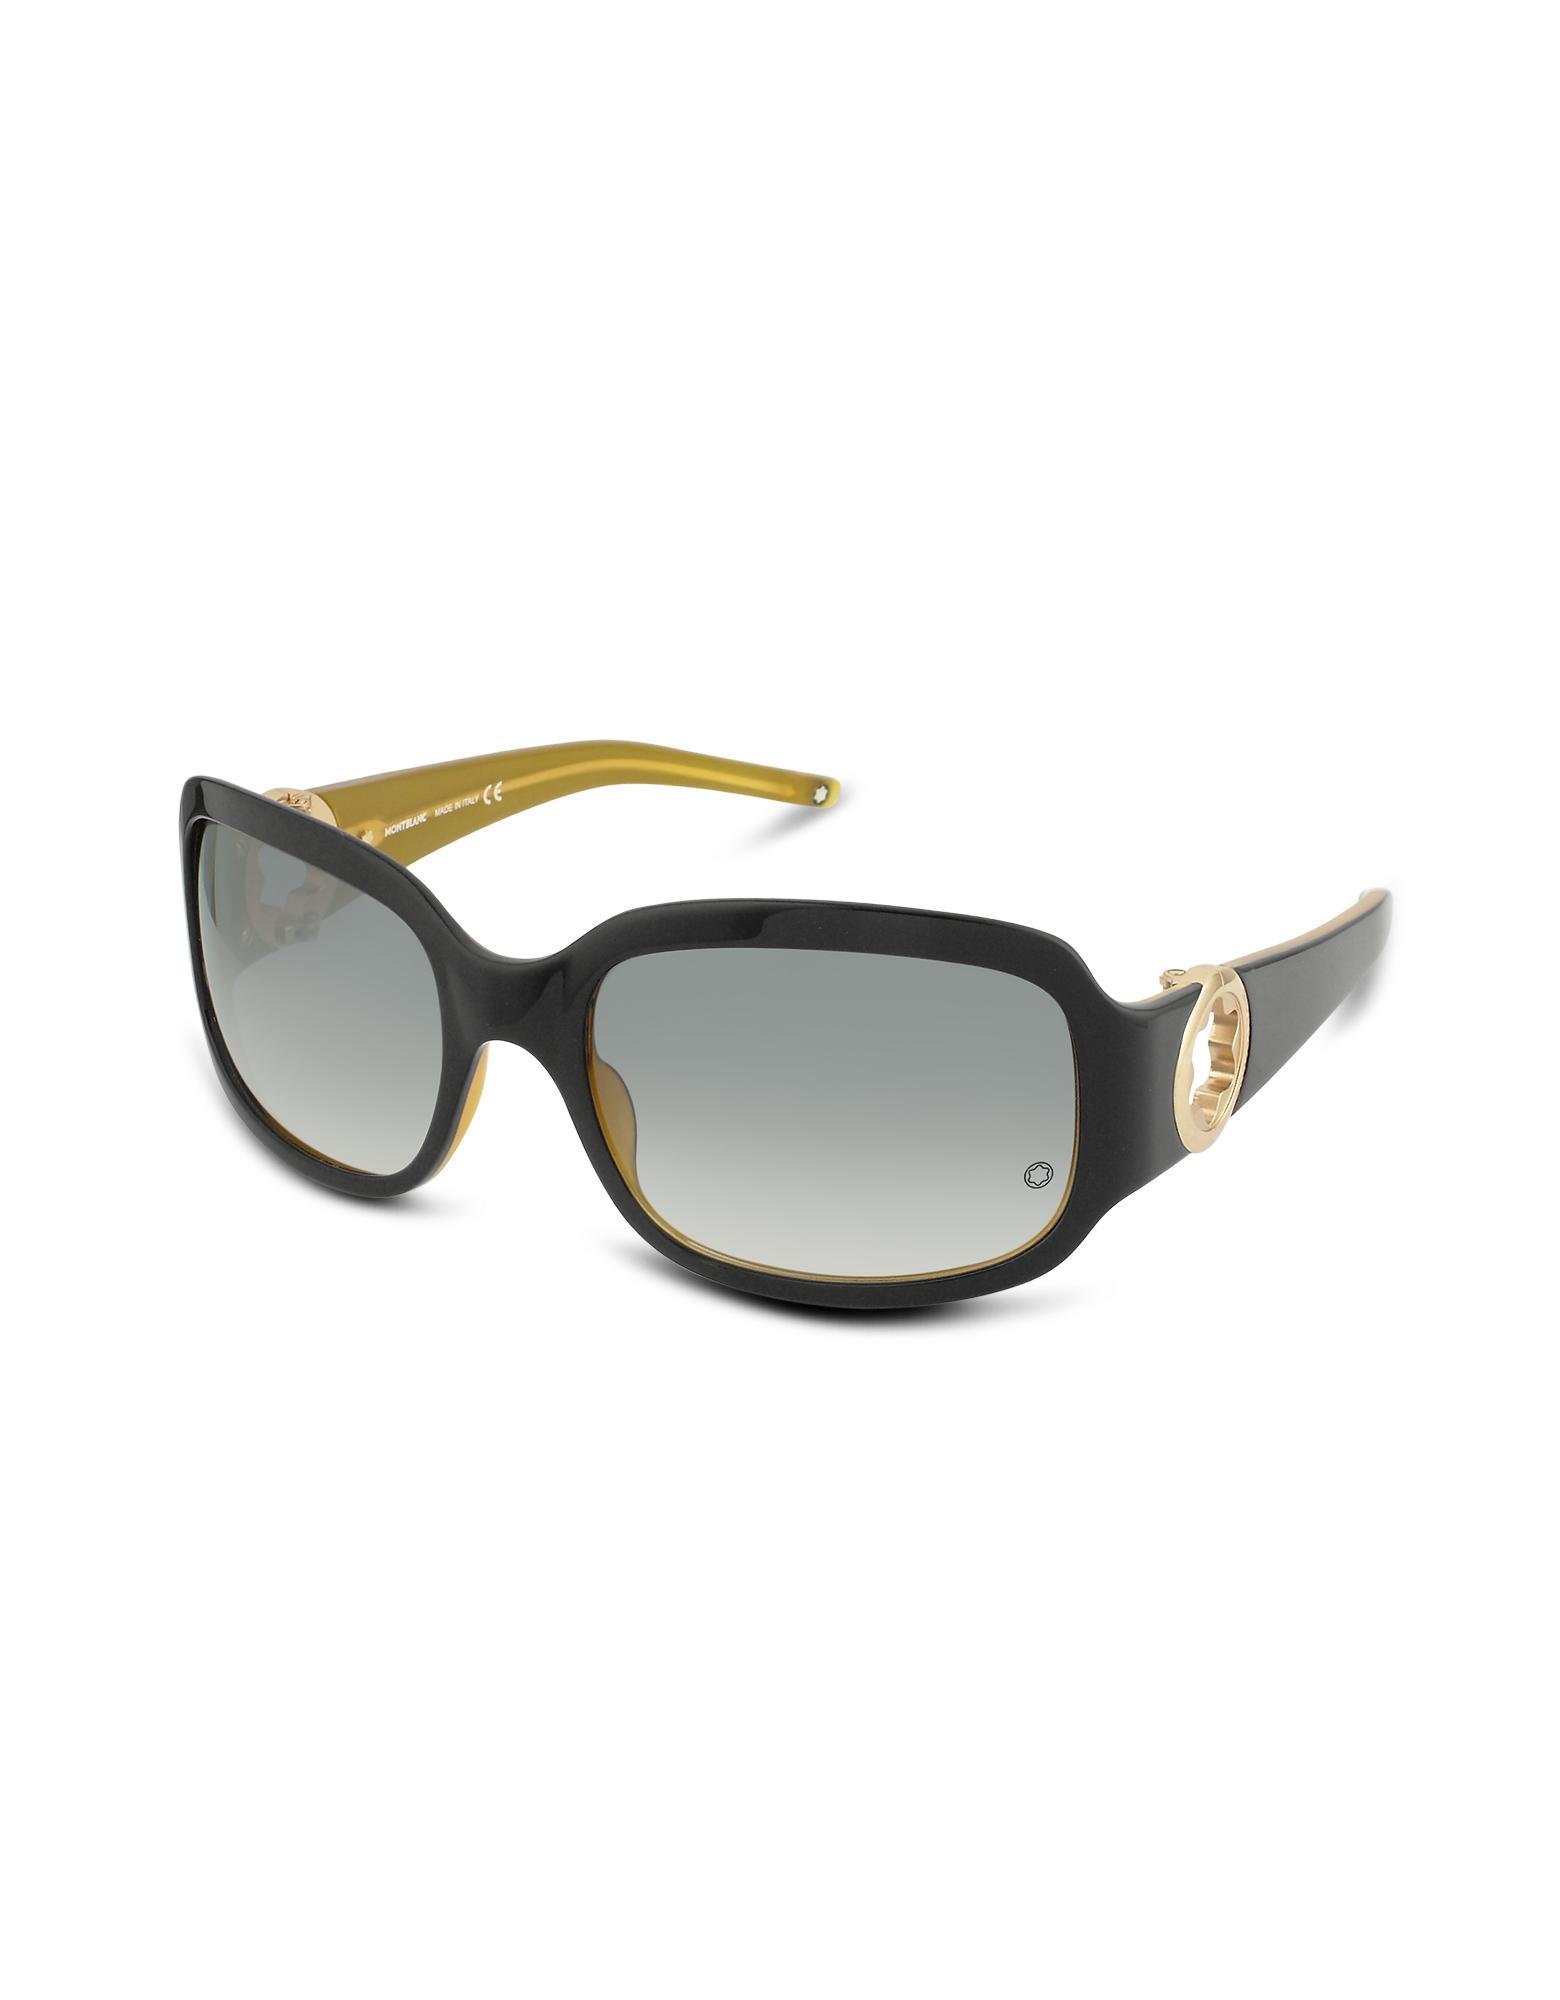 Montblanc Trendy New Signature - Ladystar Cutout Logo Plastic Sunglasses